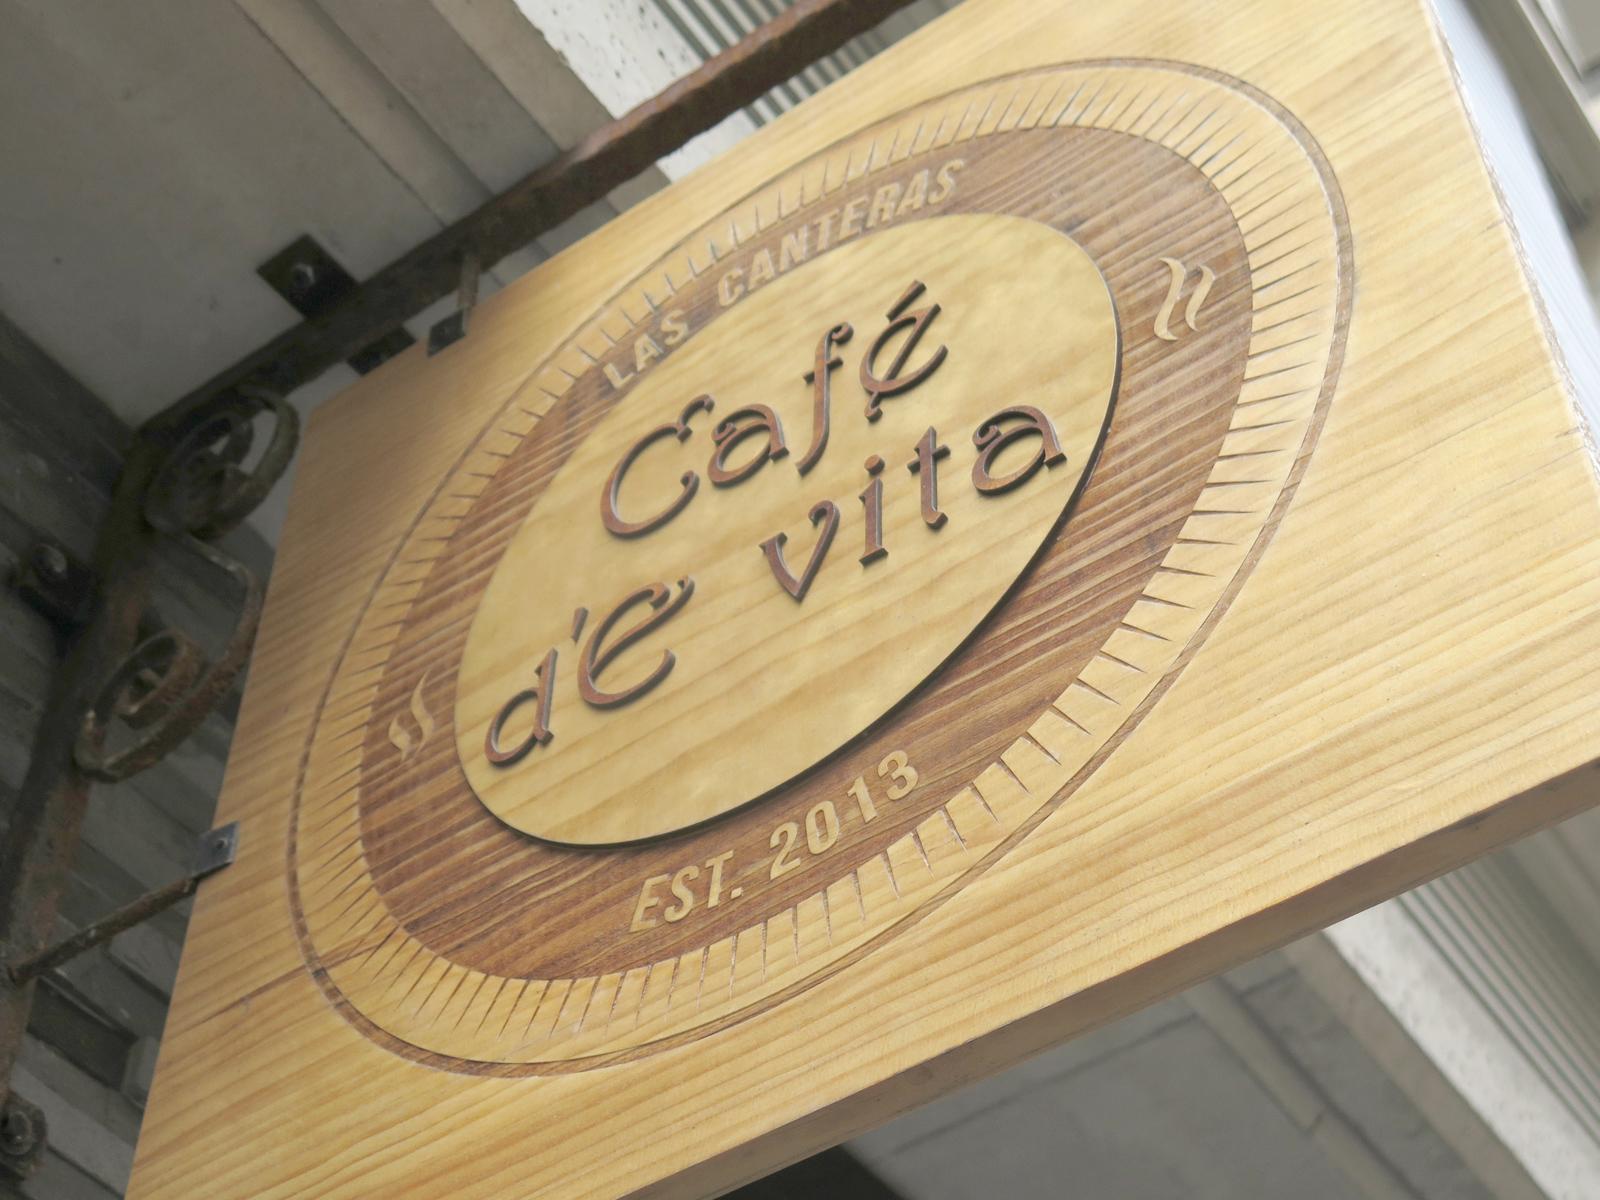 THE OFFICE_cafedevita02 copia.jpg